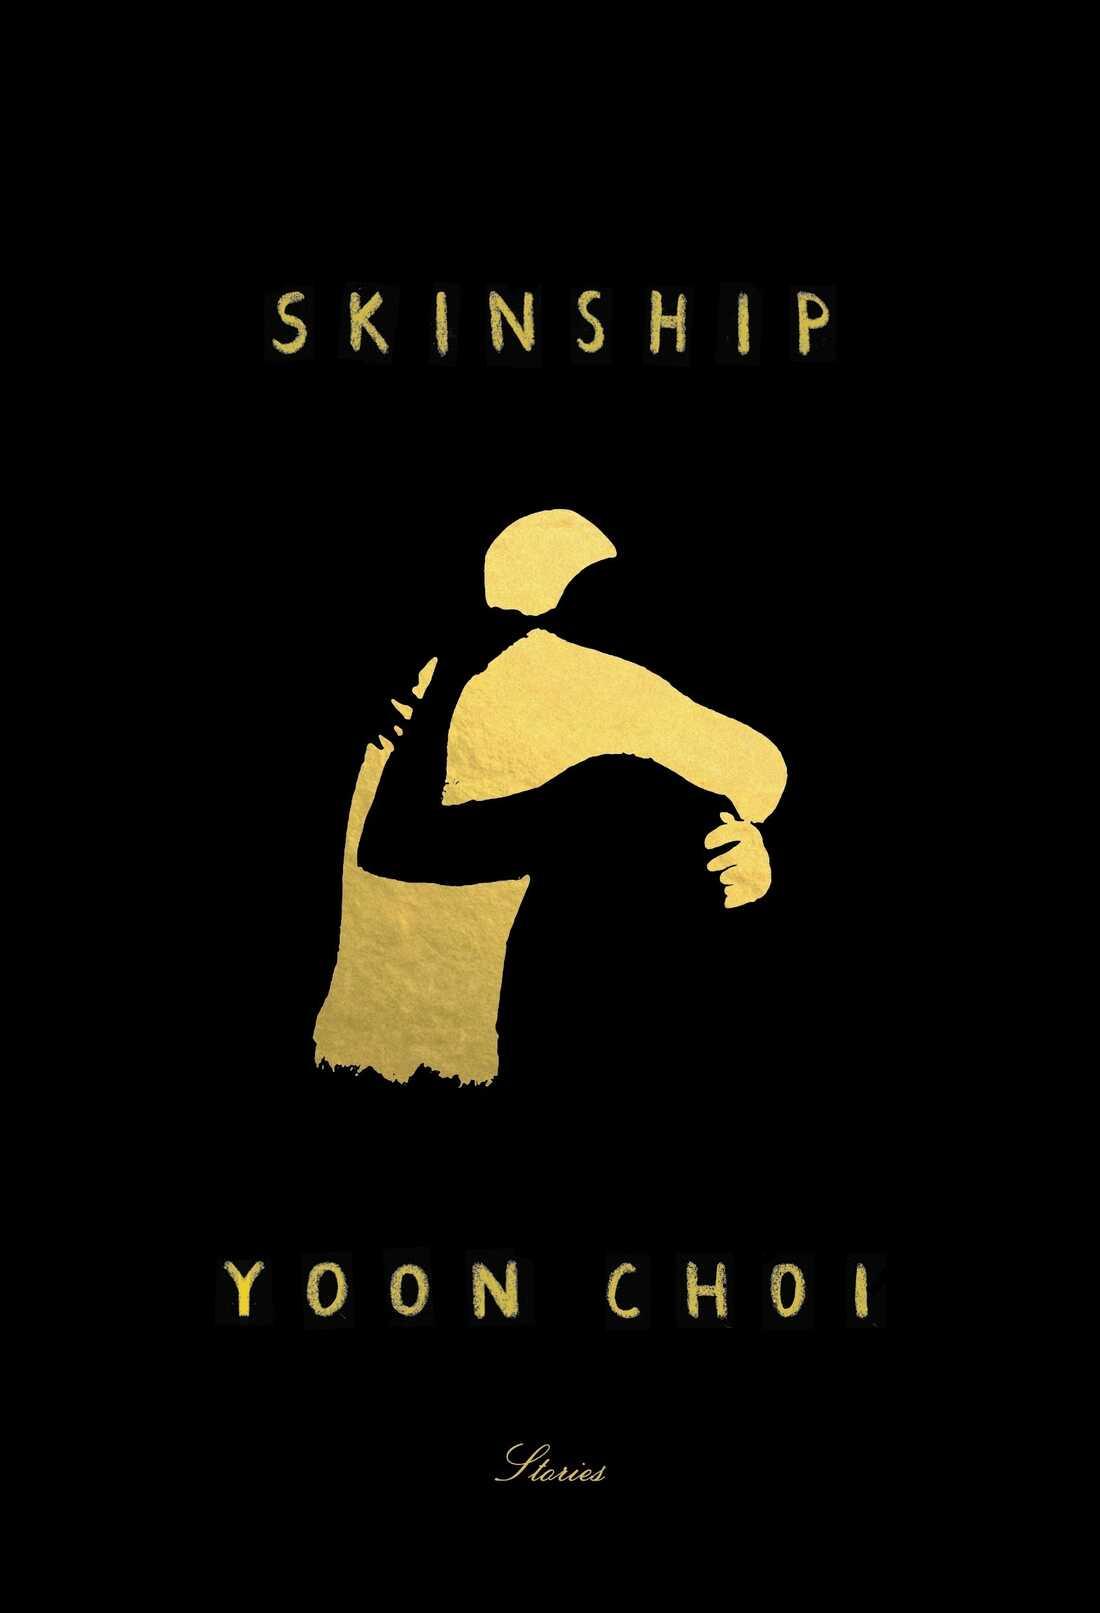 Skinship, by Yoon Choi